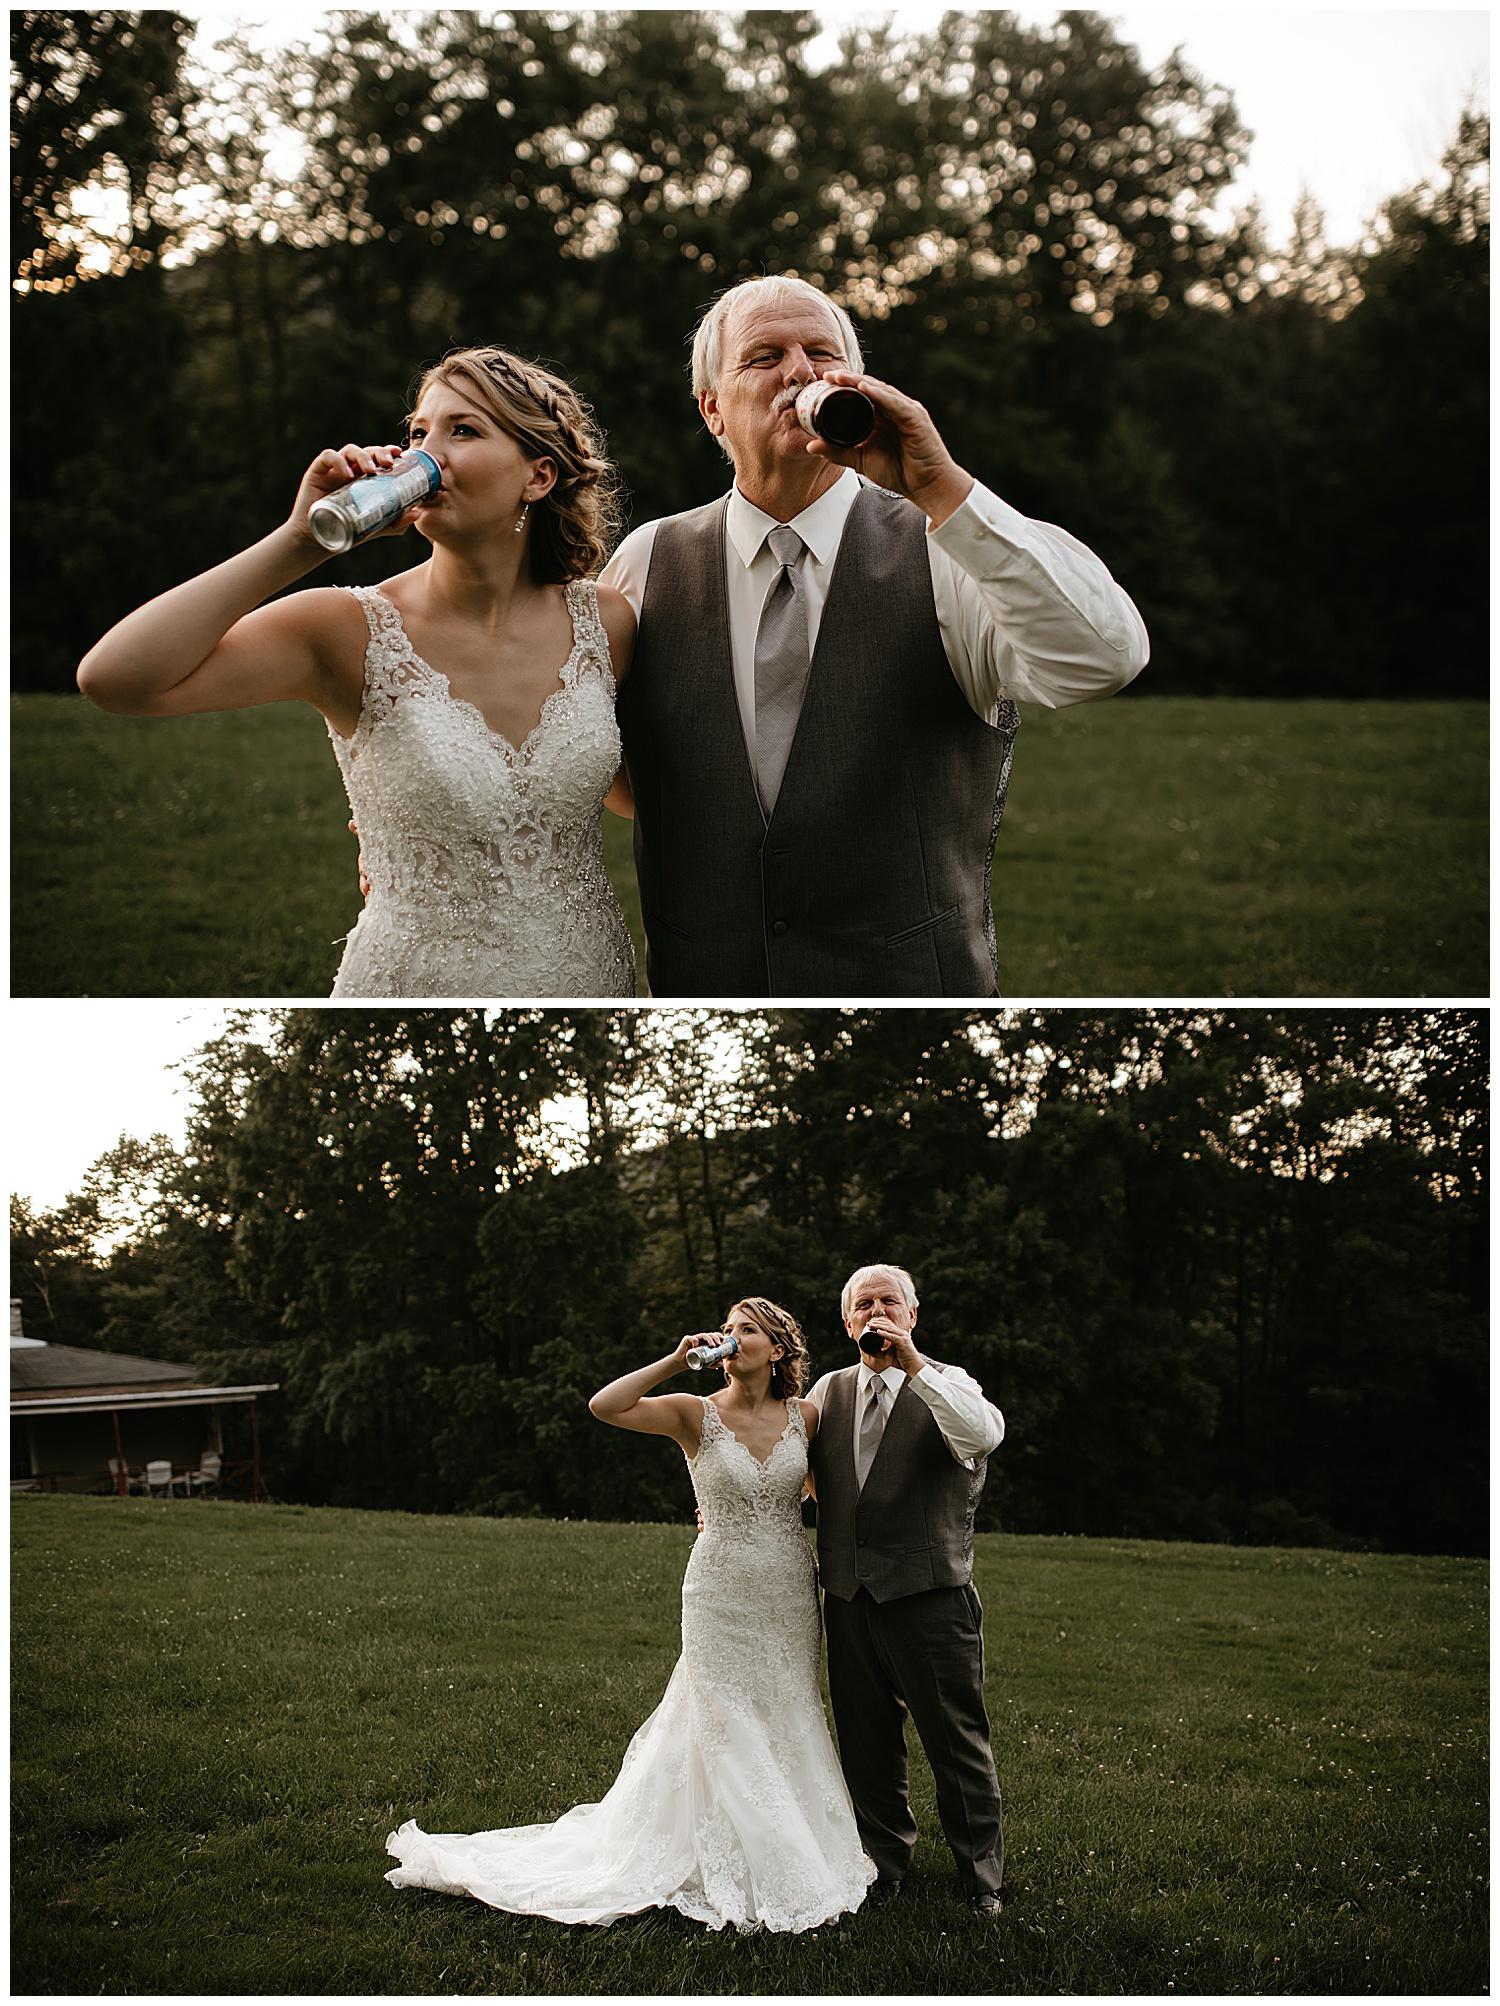 NEPA-Lehigh-Valley-Wedding-Photographer-at-Fountain-Springs-Country-Inn-Ashland-PA_0067.jpg